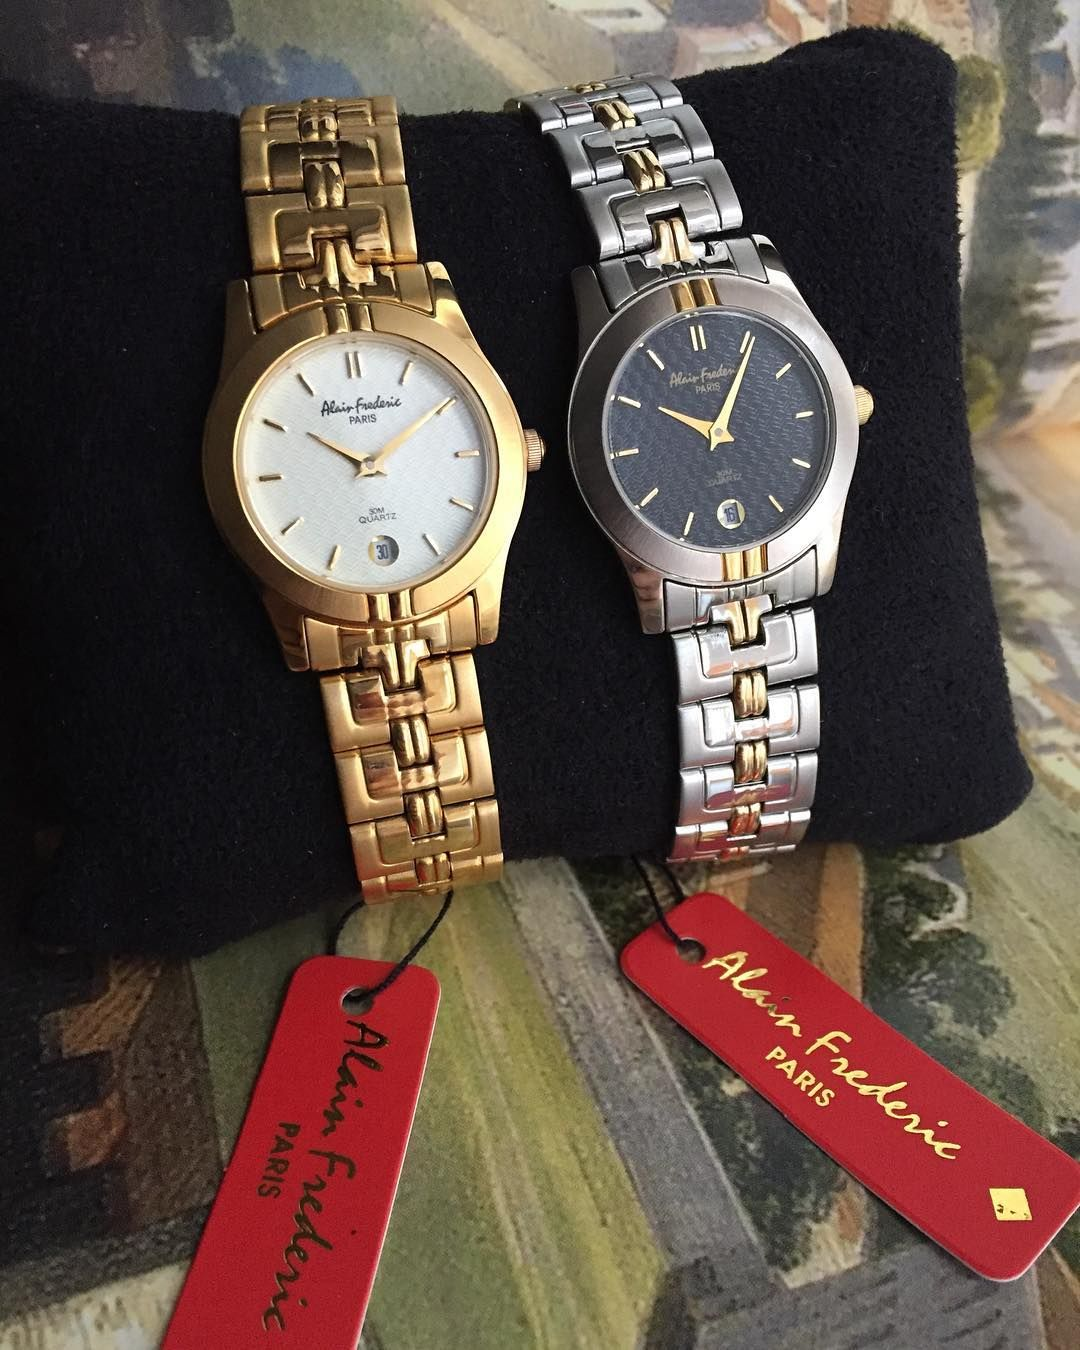 Alain Frederic Paris Vintage Bayan Kol Saati Vintage Vintagesaat Vintagewatch Saat Saatler Saatmodelleri Tasarim Hediye V 2020 Vintage Saat Saatler Taki